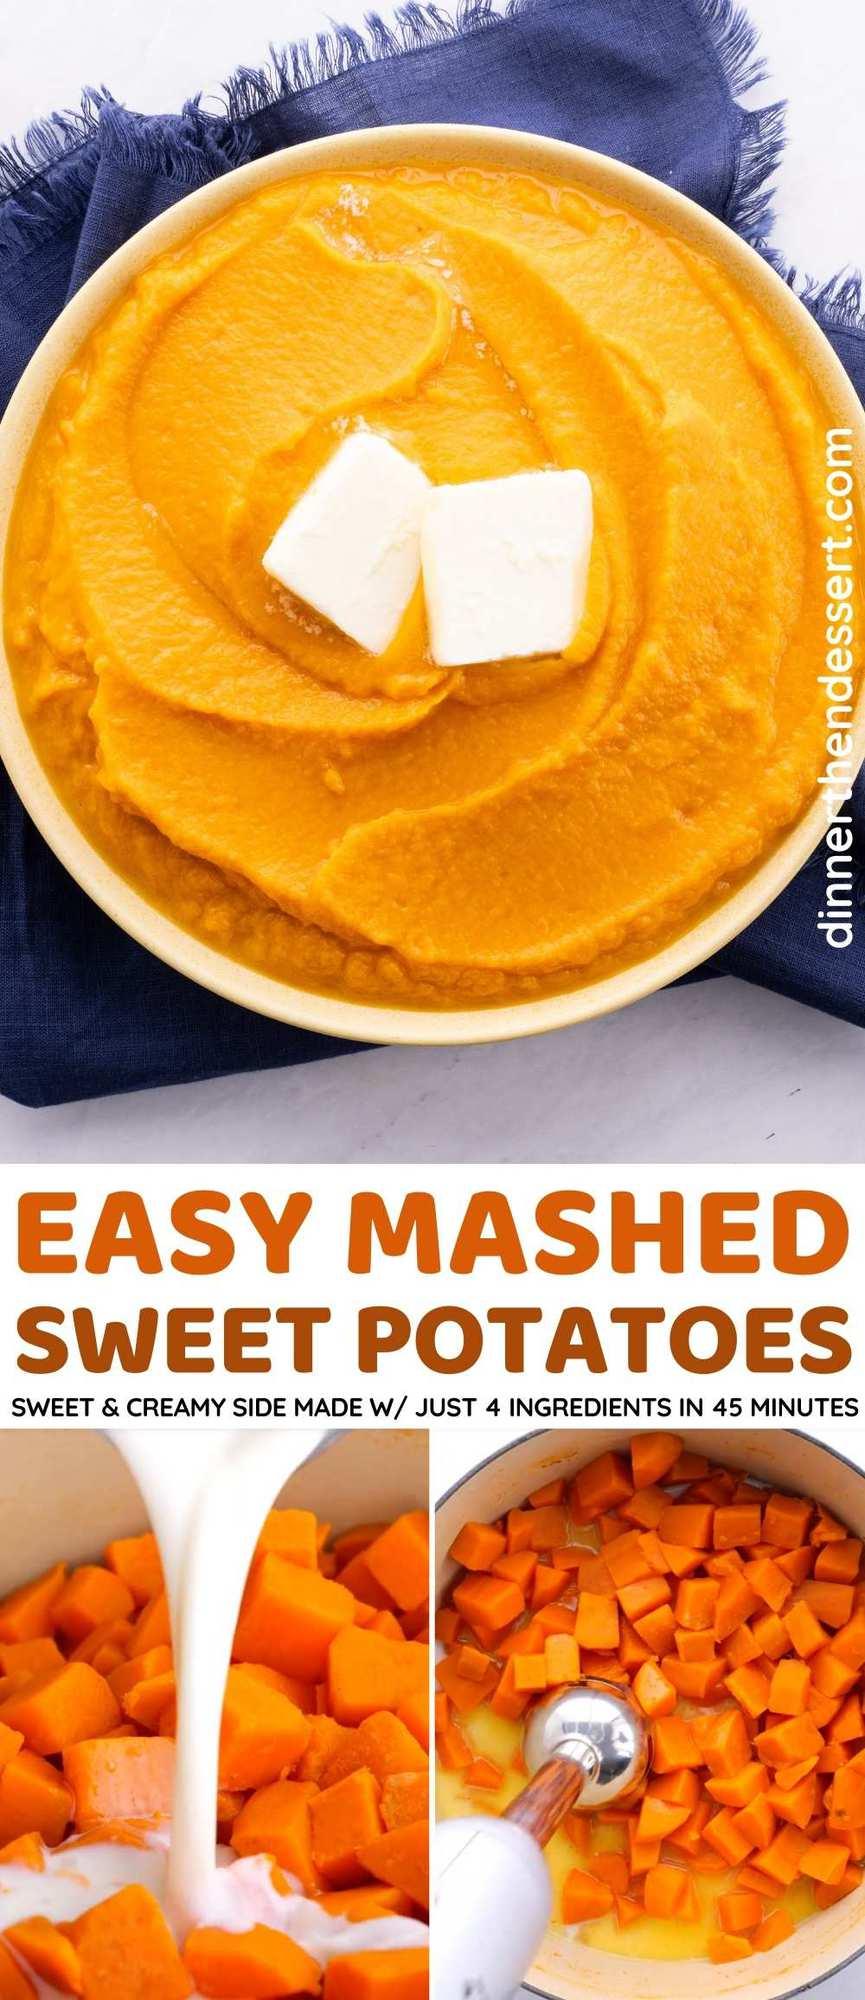 Mashed Sweet Potatoes Collage